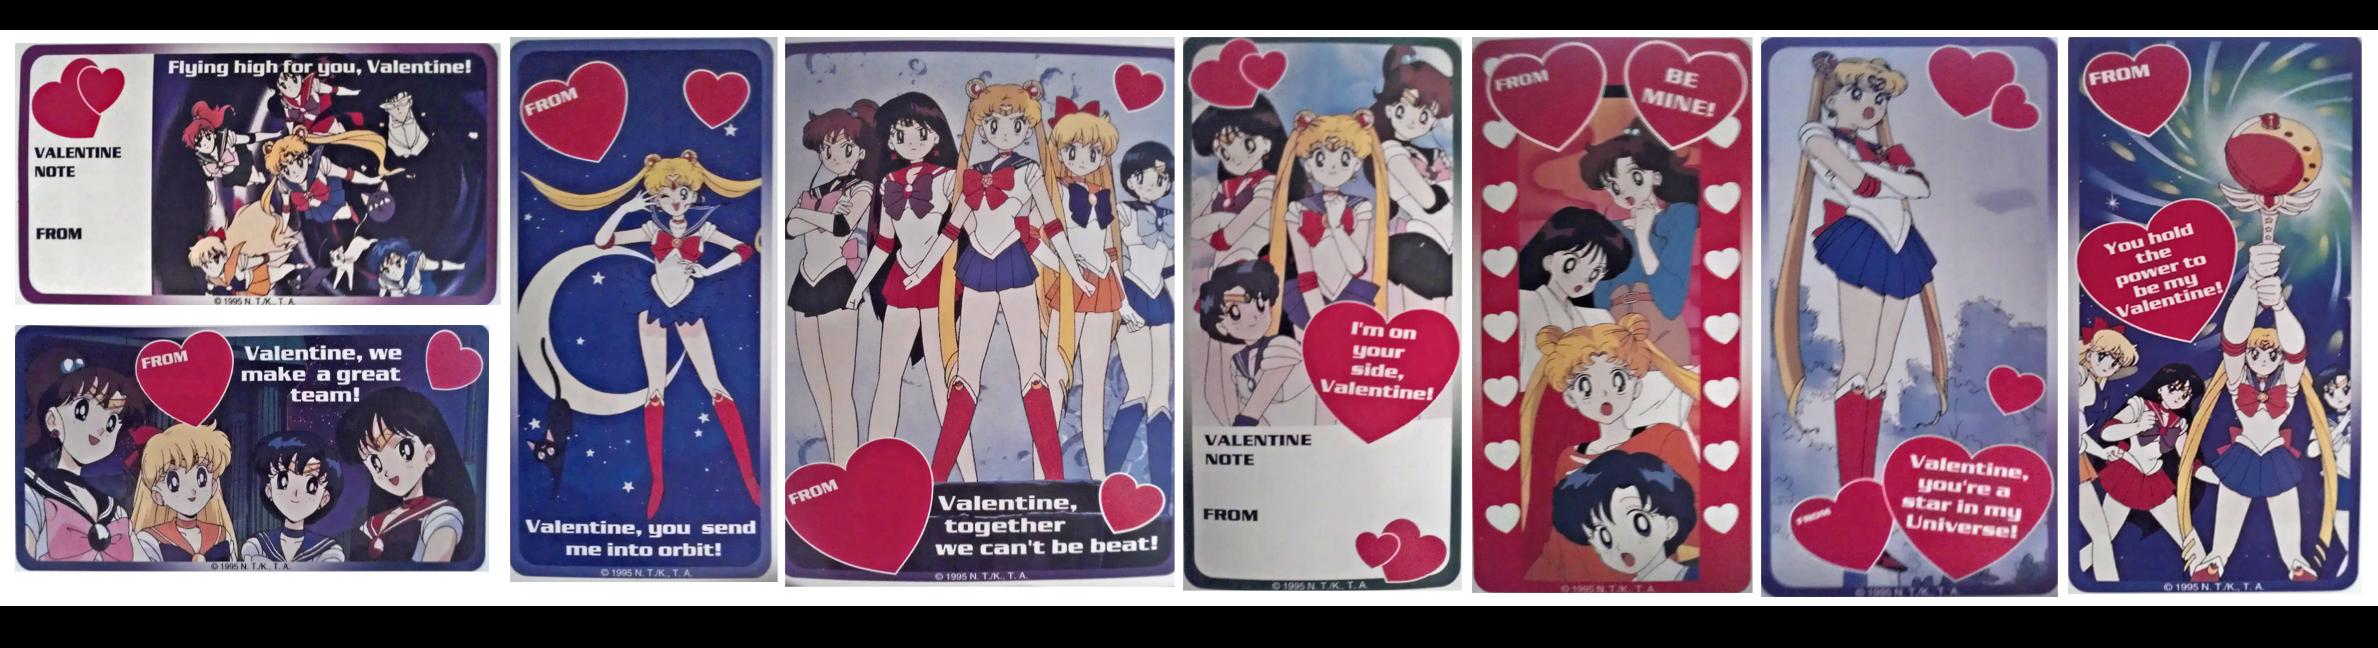 Schön Sailor Moon Valentine Cards By Arashkya Sailor Moon Valentine Cards By  Arashkya